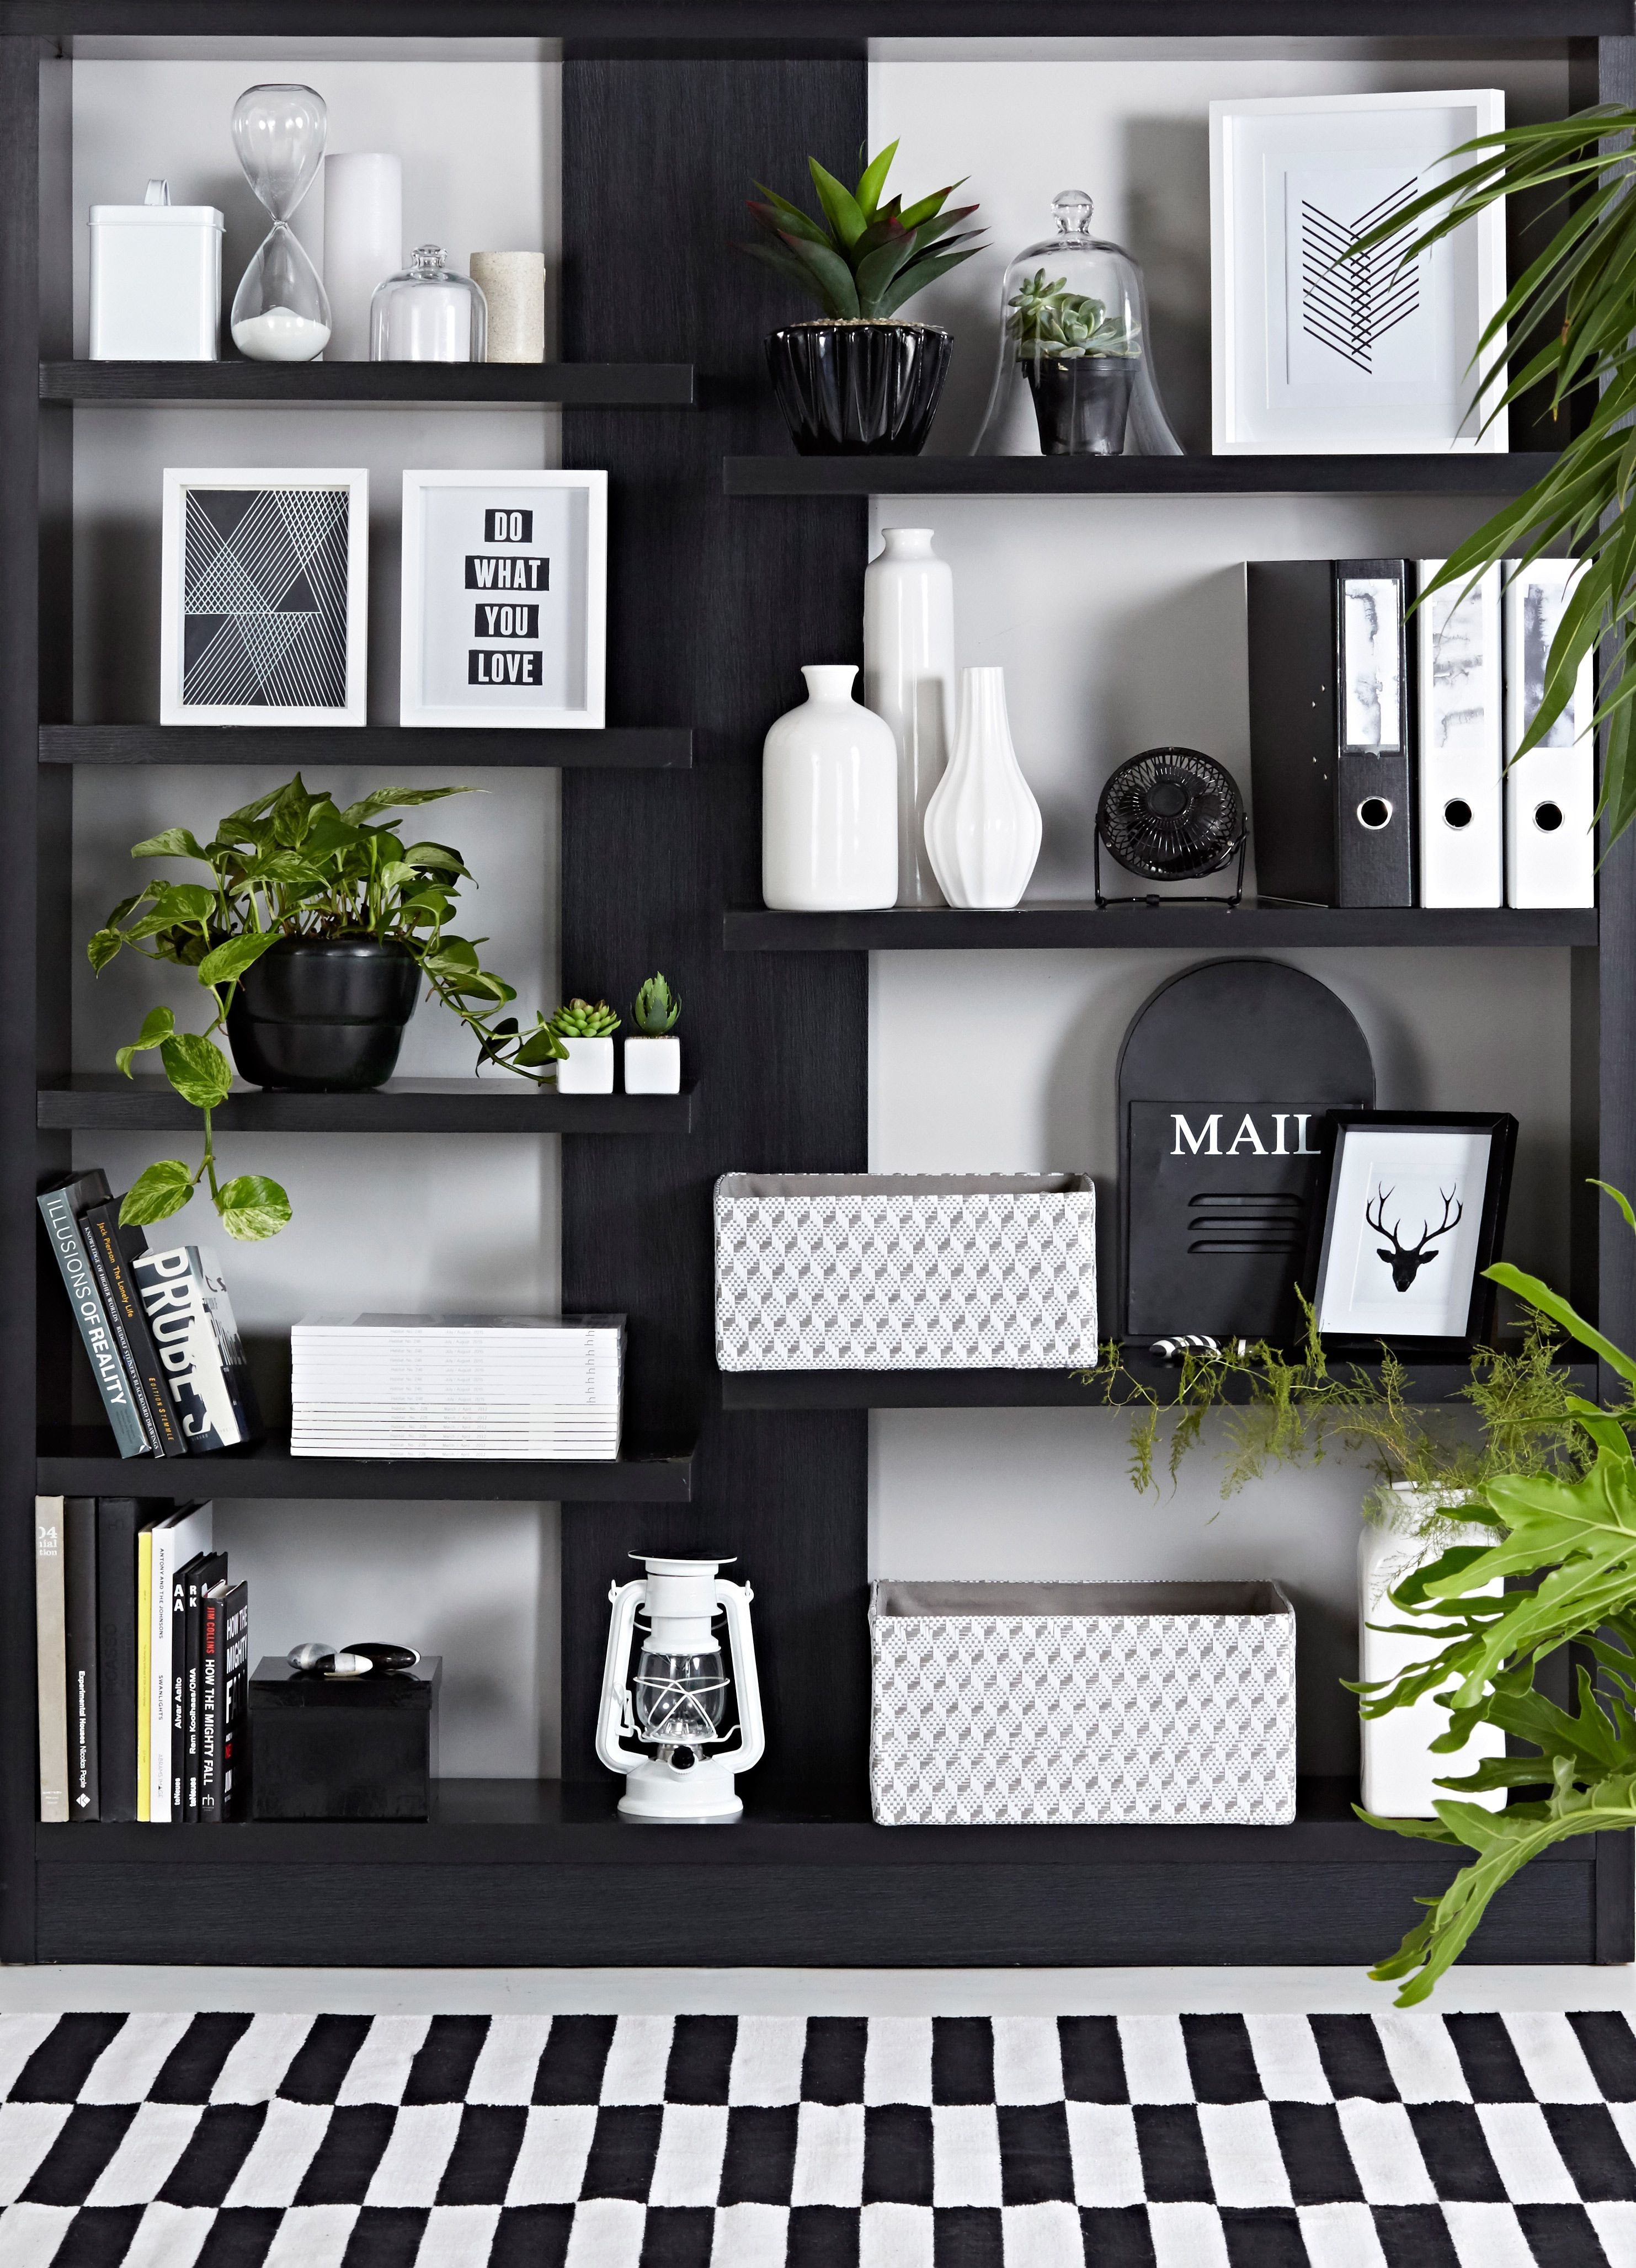 Pin By Mrphome Mr Price Home On Mrphome Spring 2015 Bookcase Decor Shelf Decor Living Room Bookshelf Styling